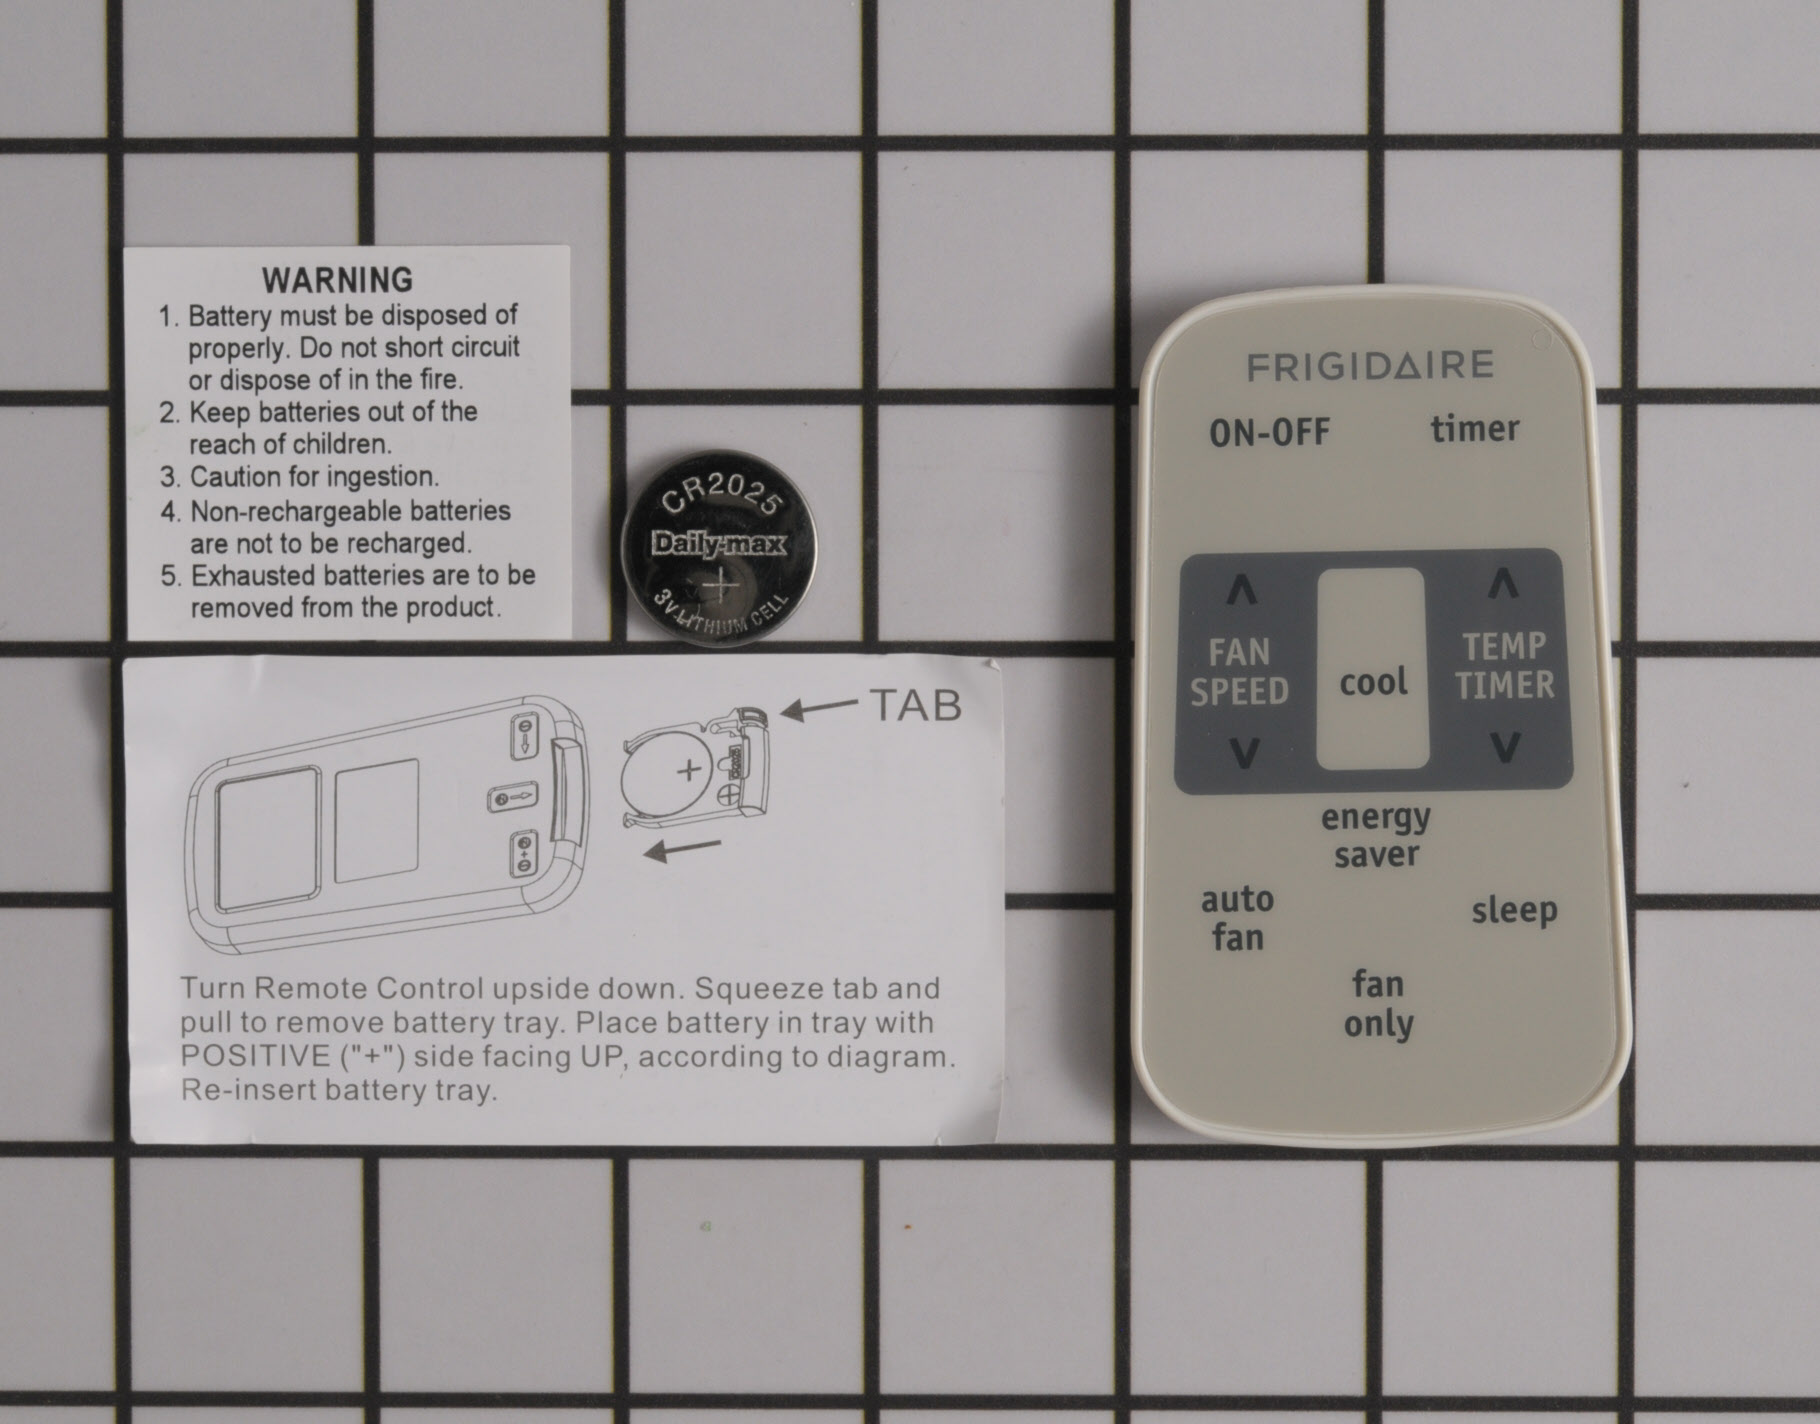 Frigidaire Air Conditioner Part # 5304487535 - Remote Control